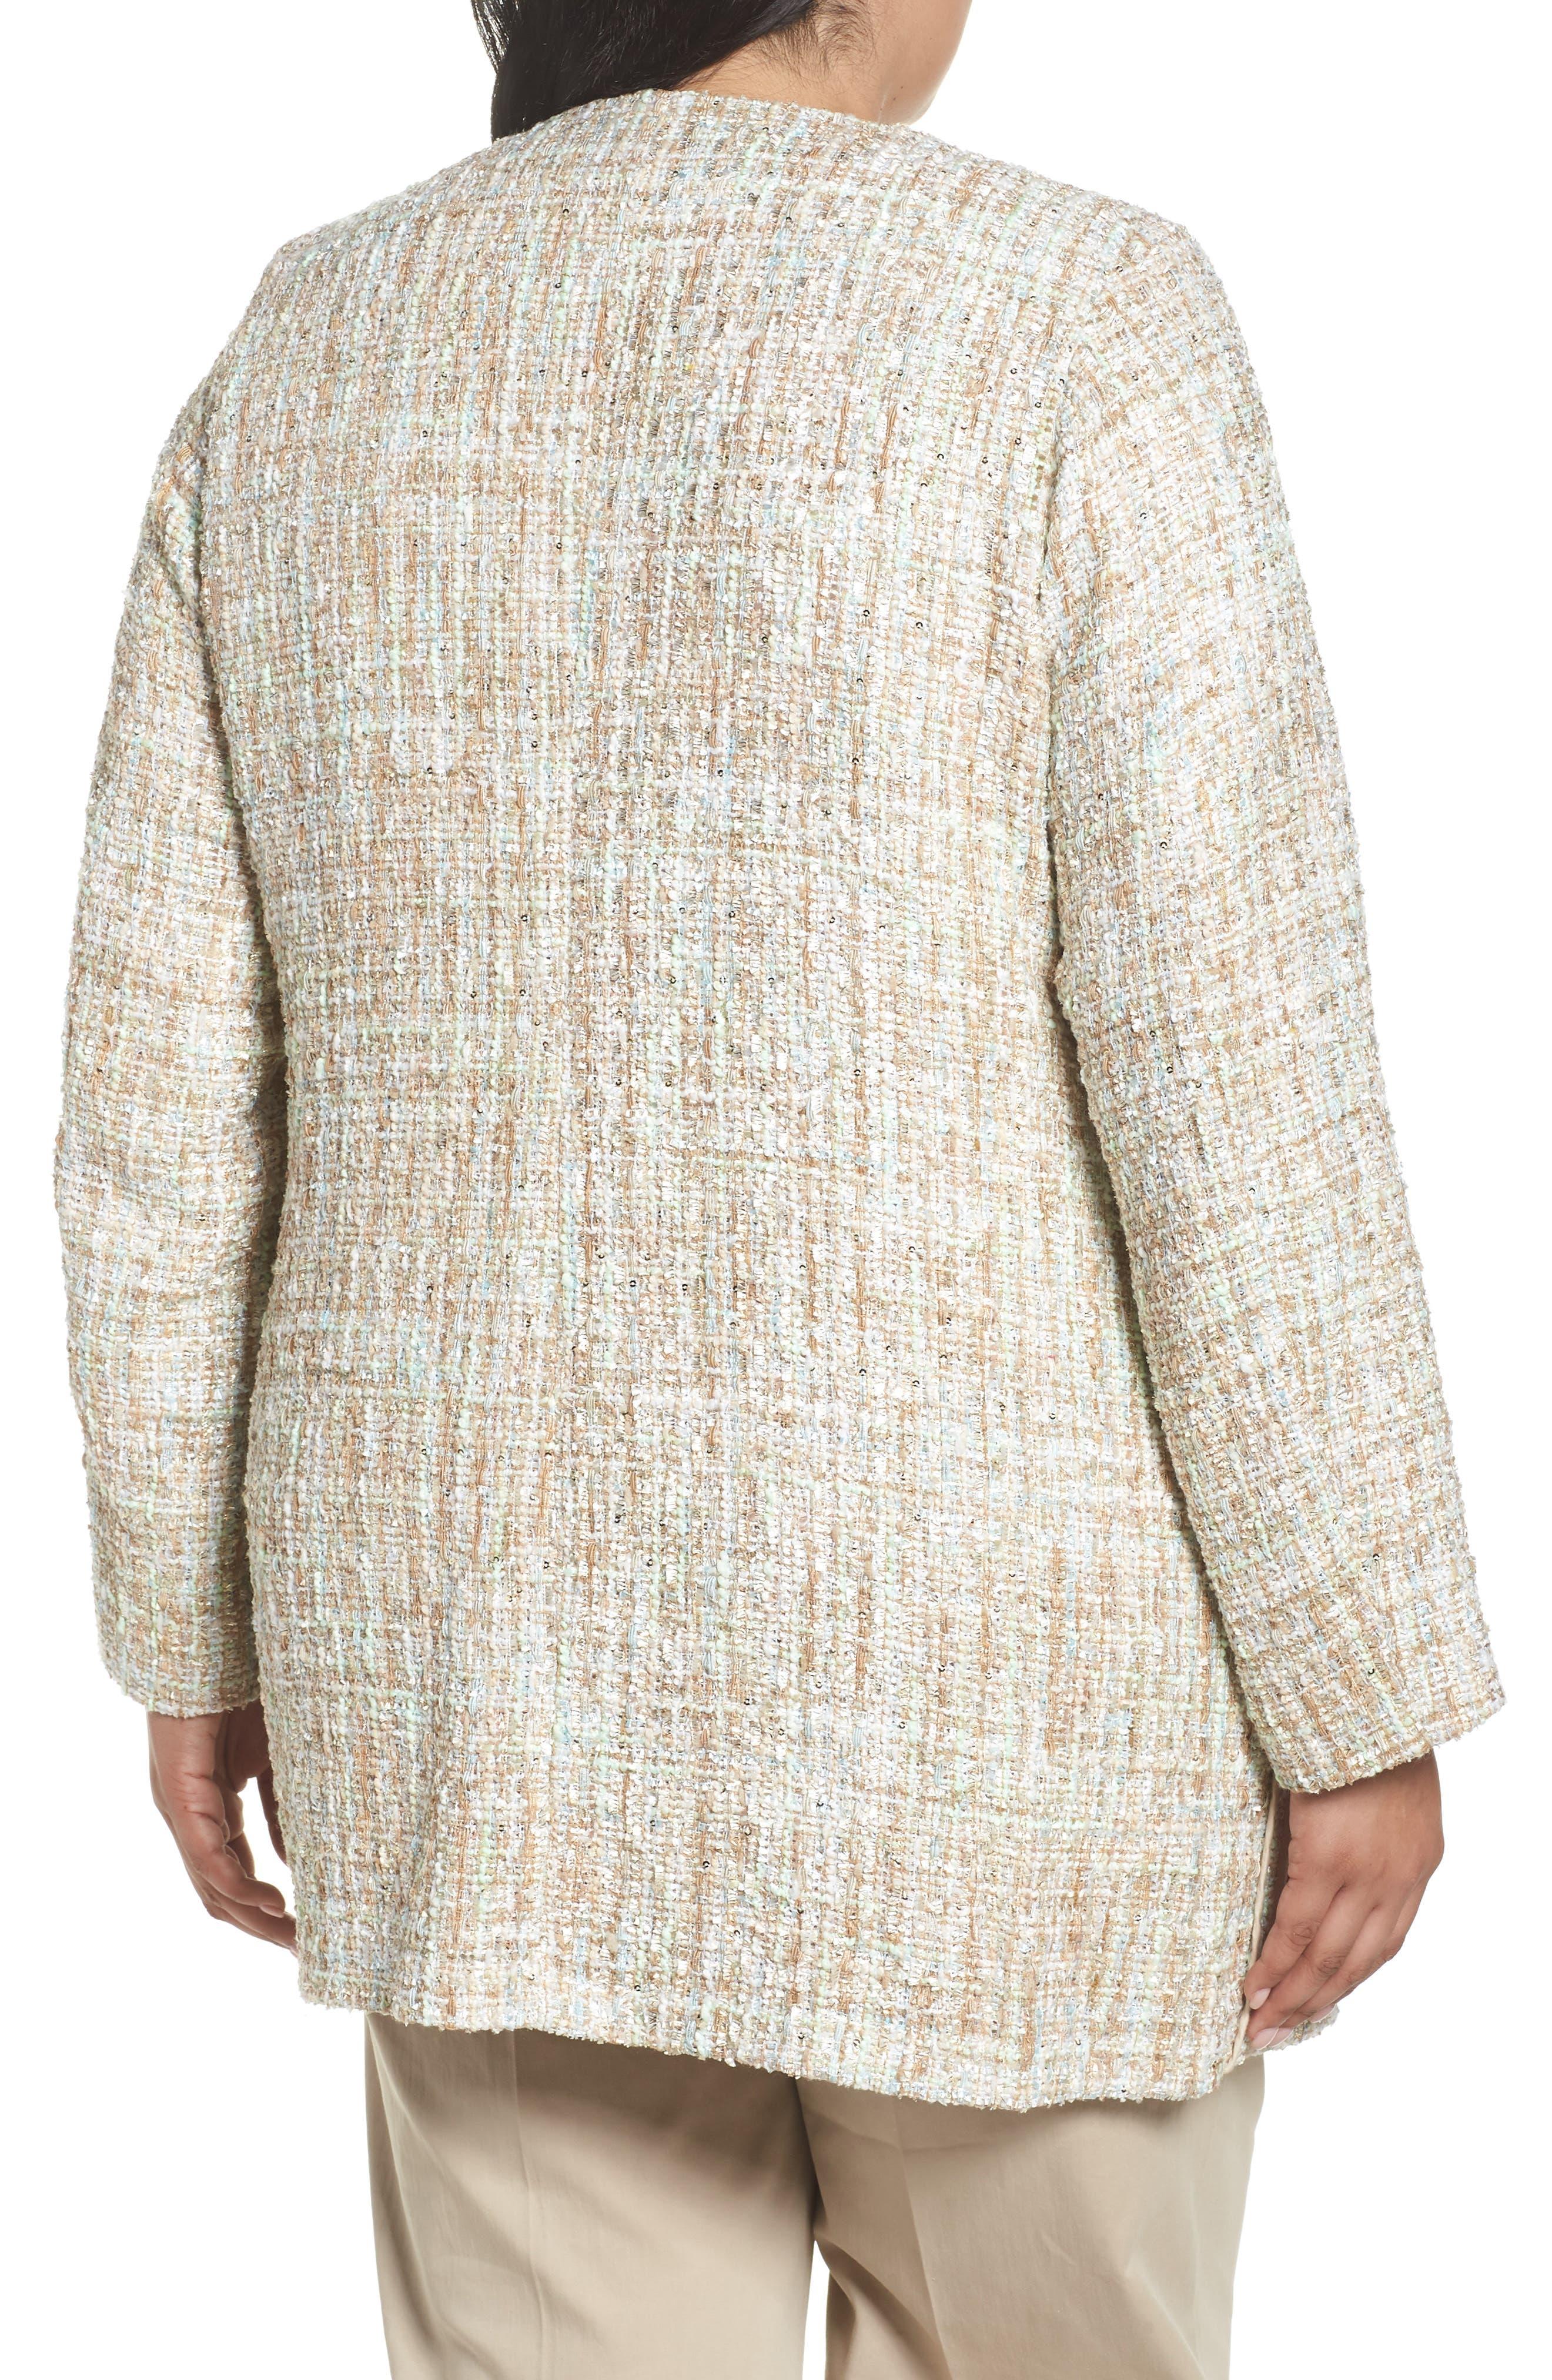 Metallic Tweed Jacket,                             Alternate thumbnail 2, color,                             901